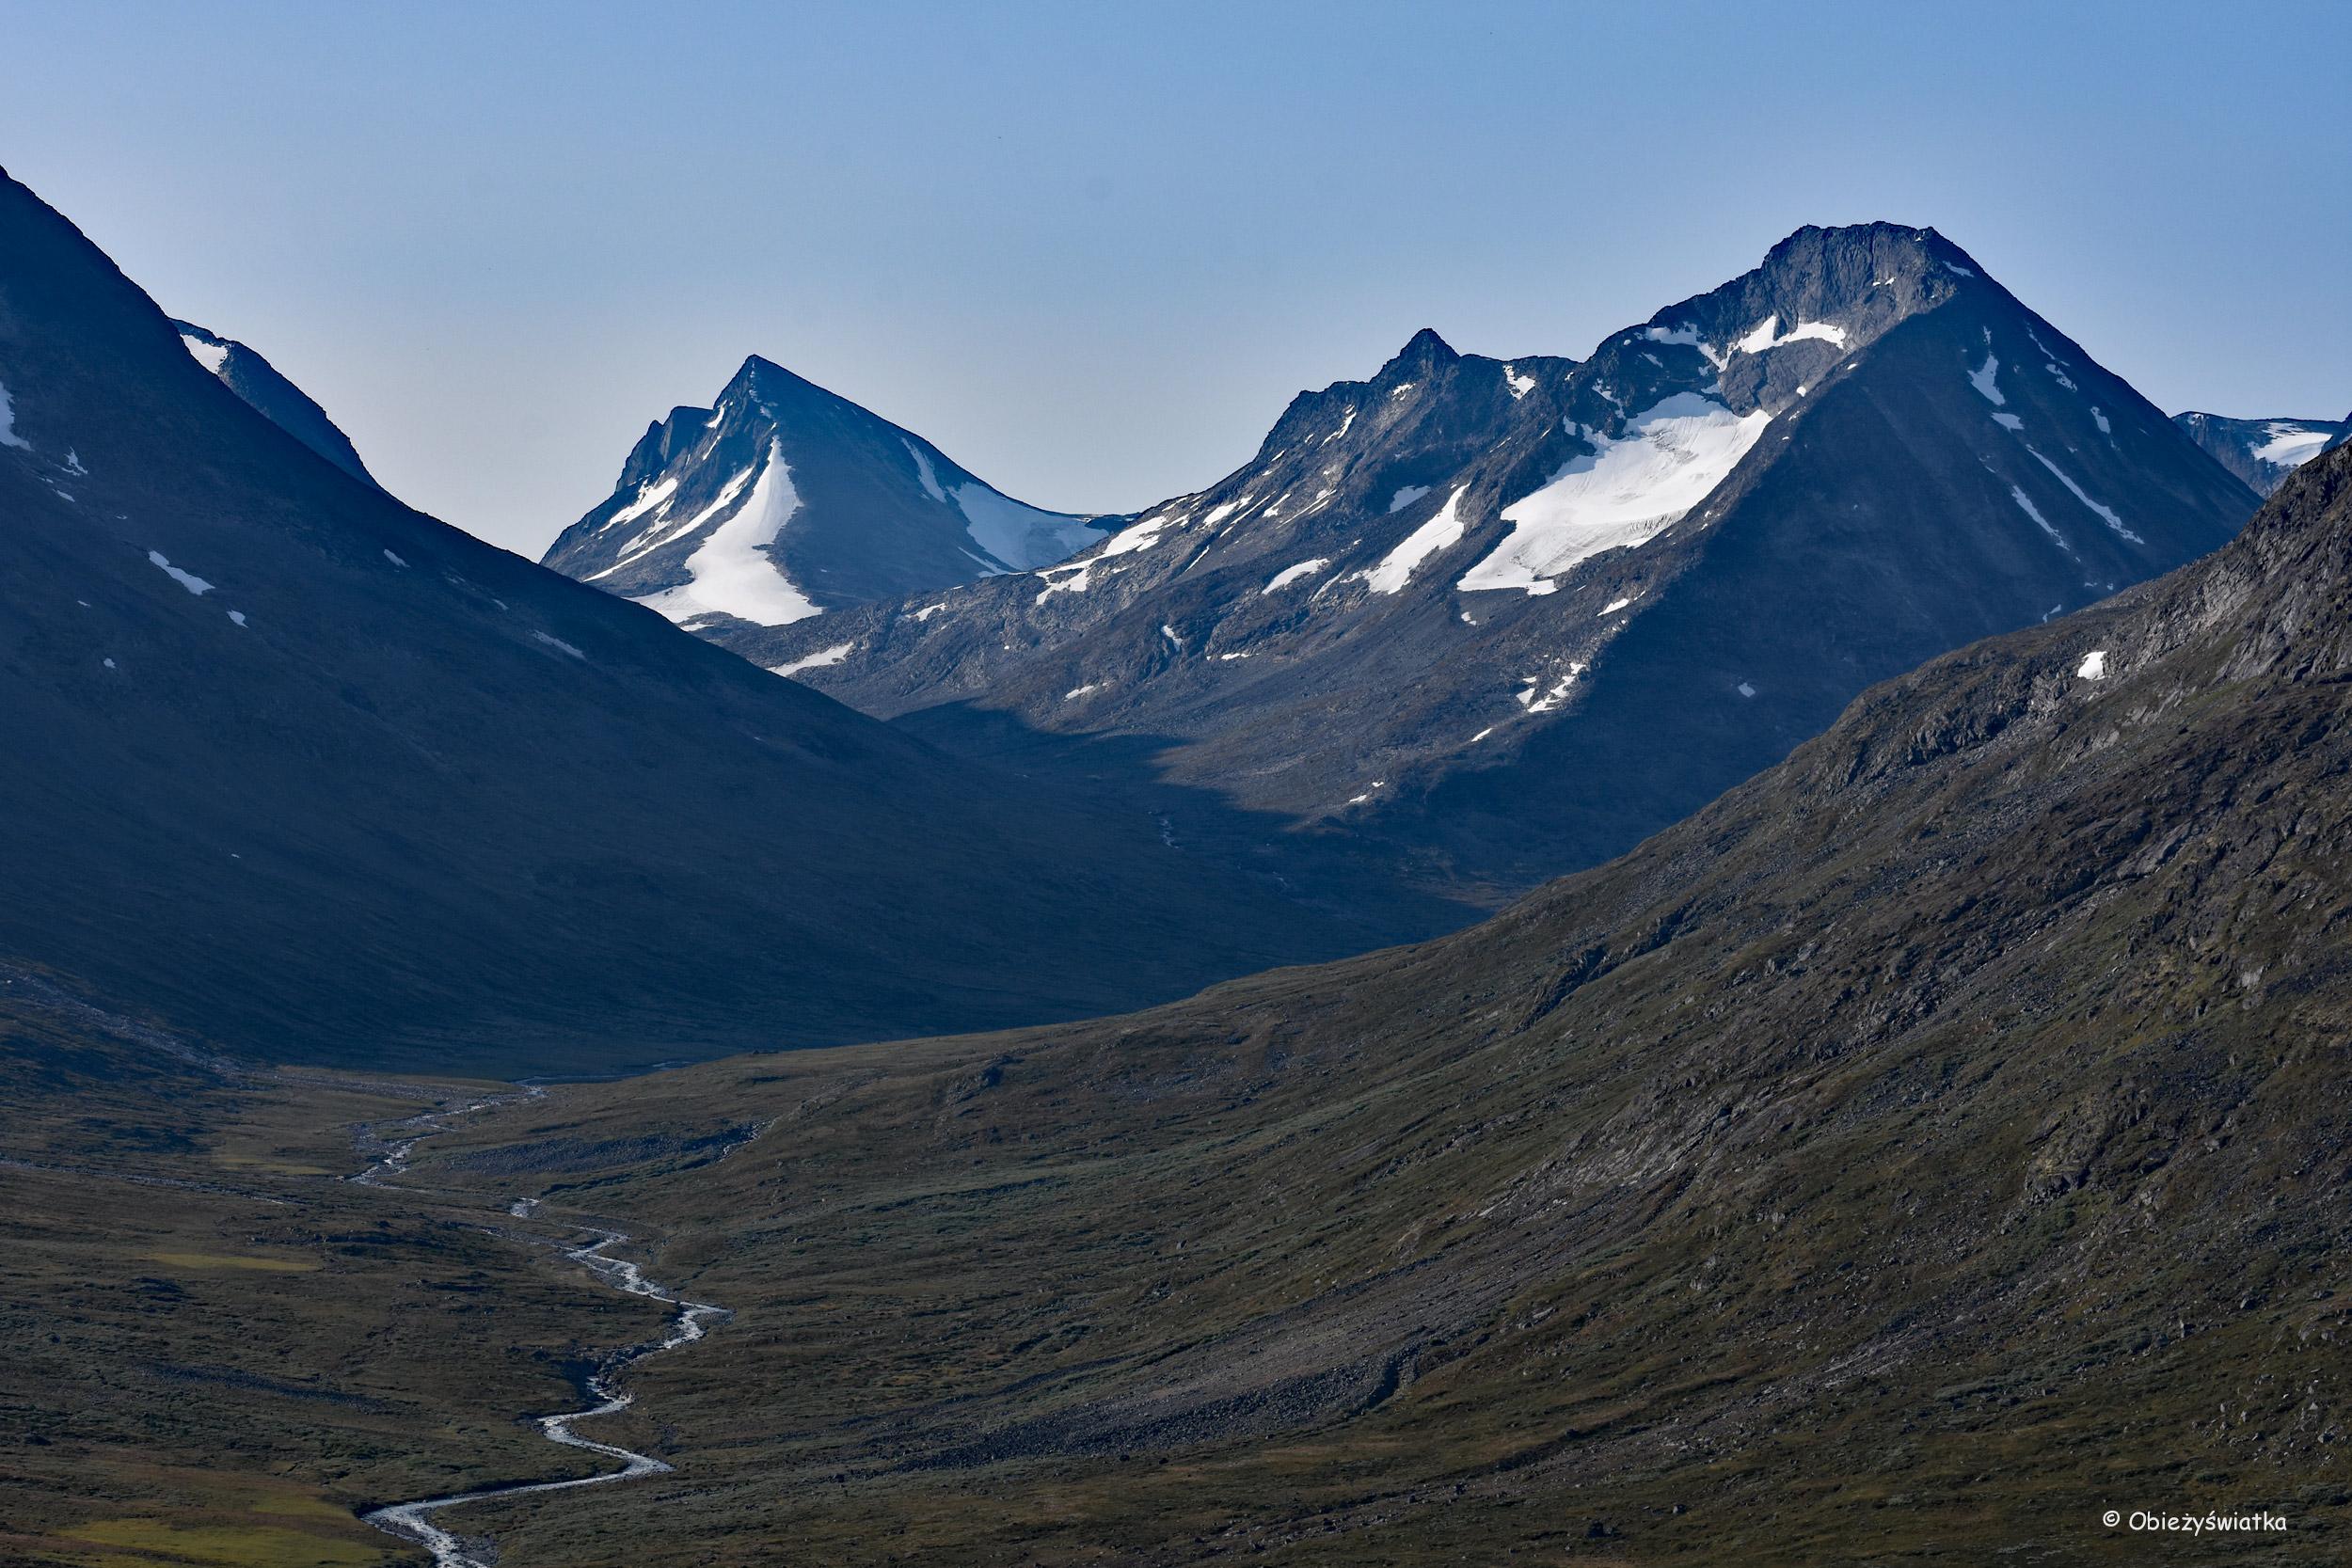 Dolina przy schronisku Spiterstulen